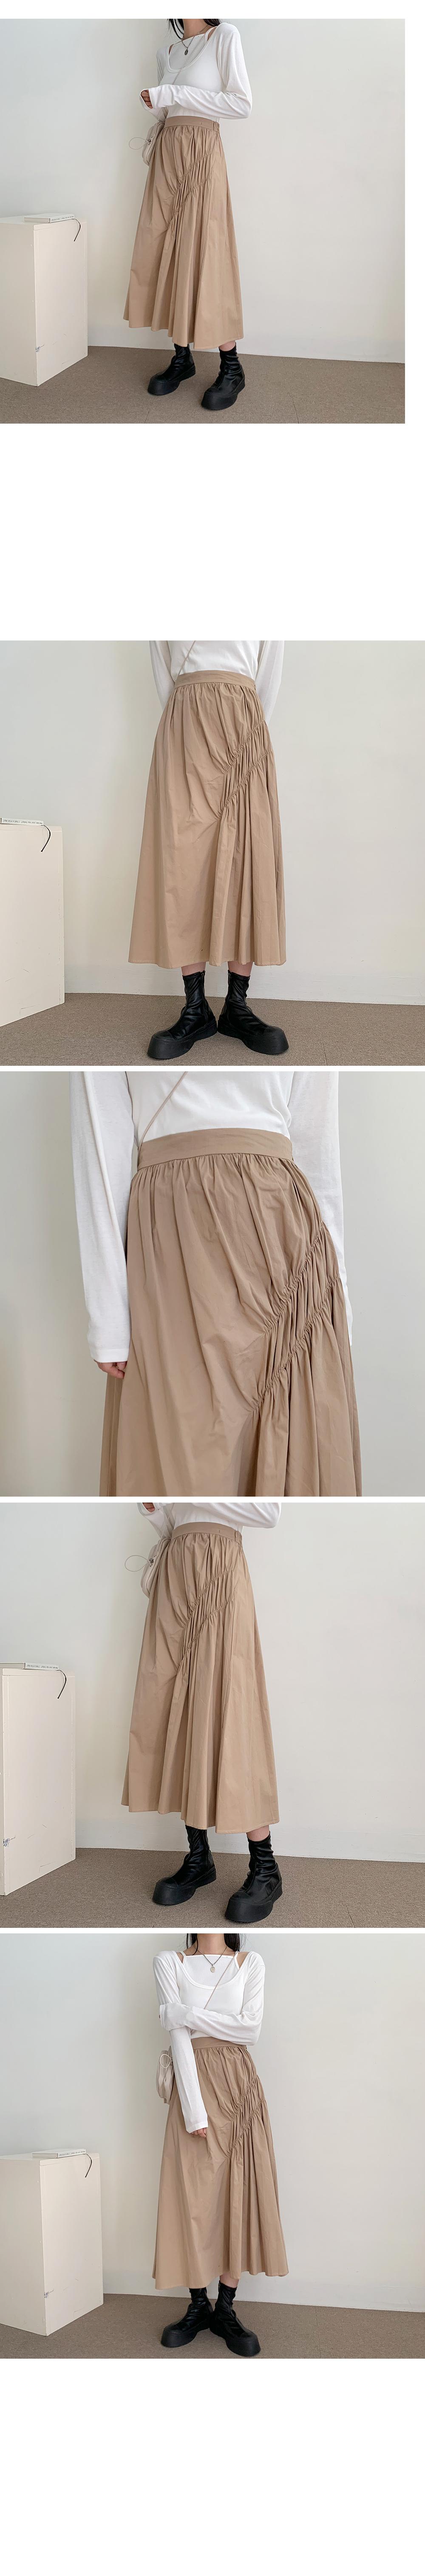 Unbald Shirring Long Skirt